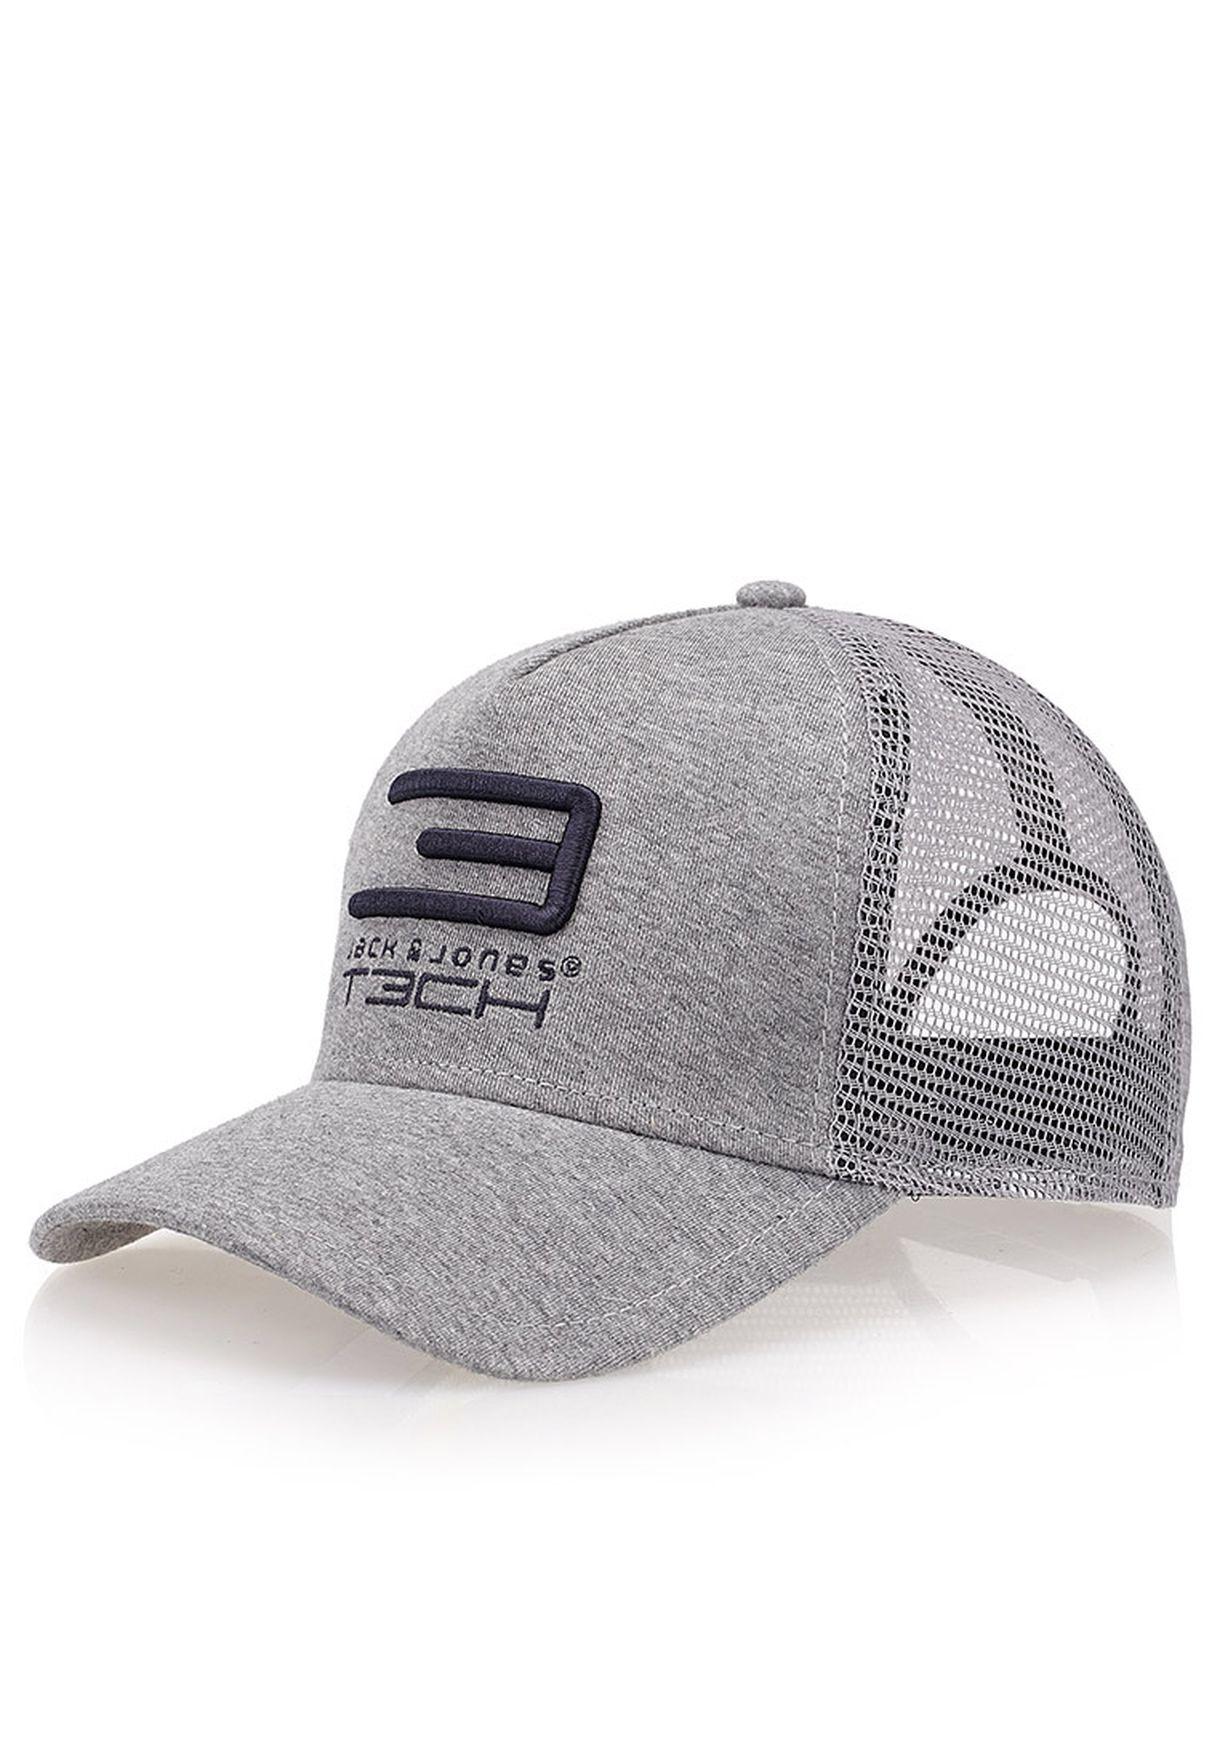 Shop Jack Jones grey Grade Baseball Cap for Men in Saudi - JA872AC84POH b0df414f0c2